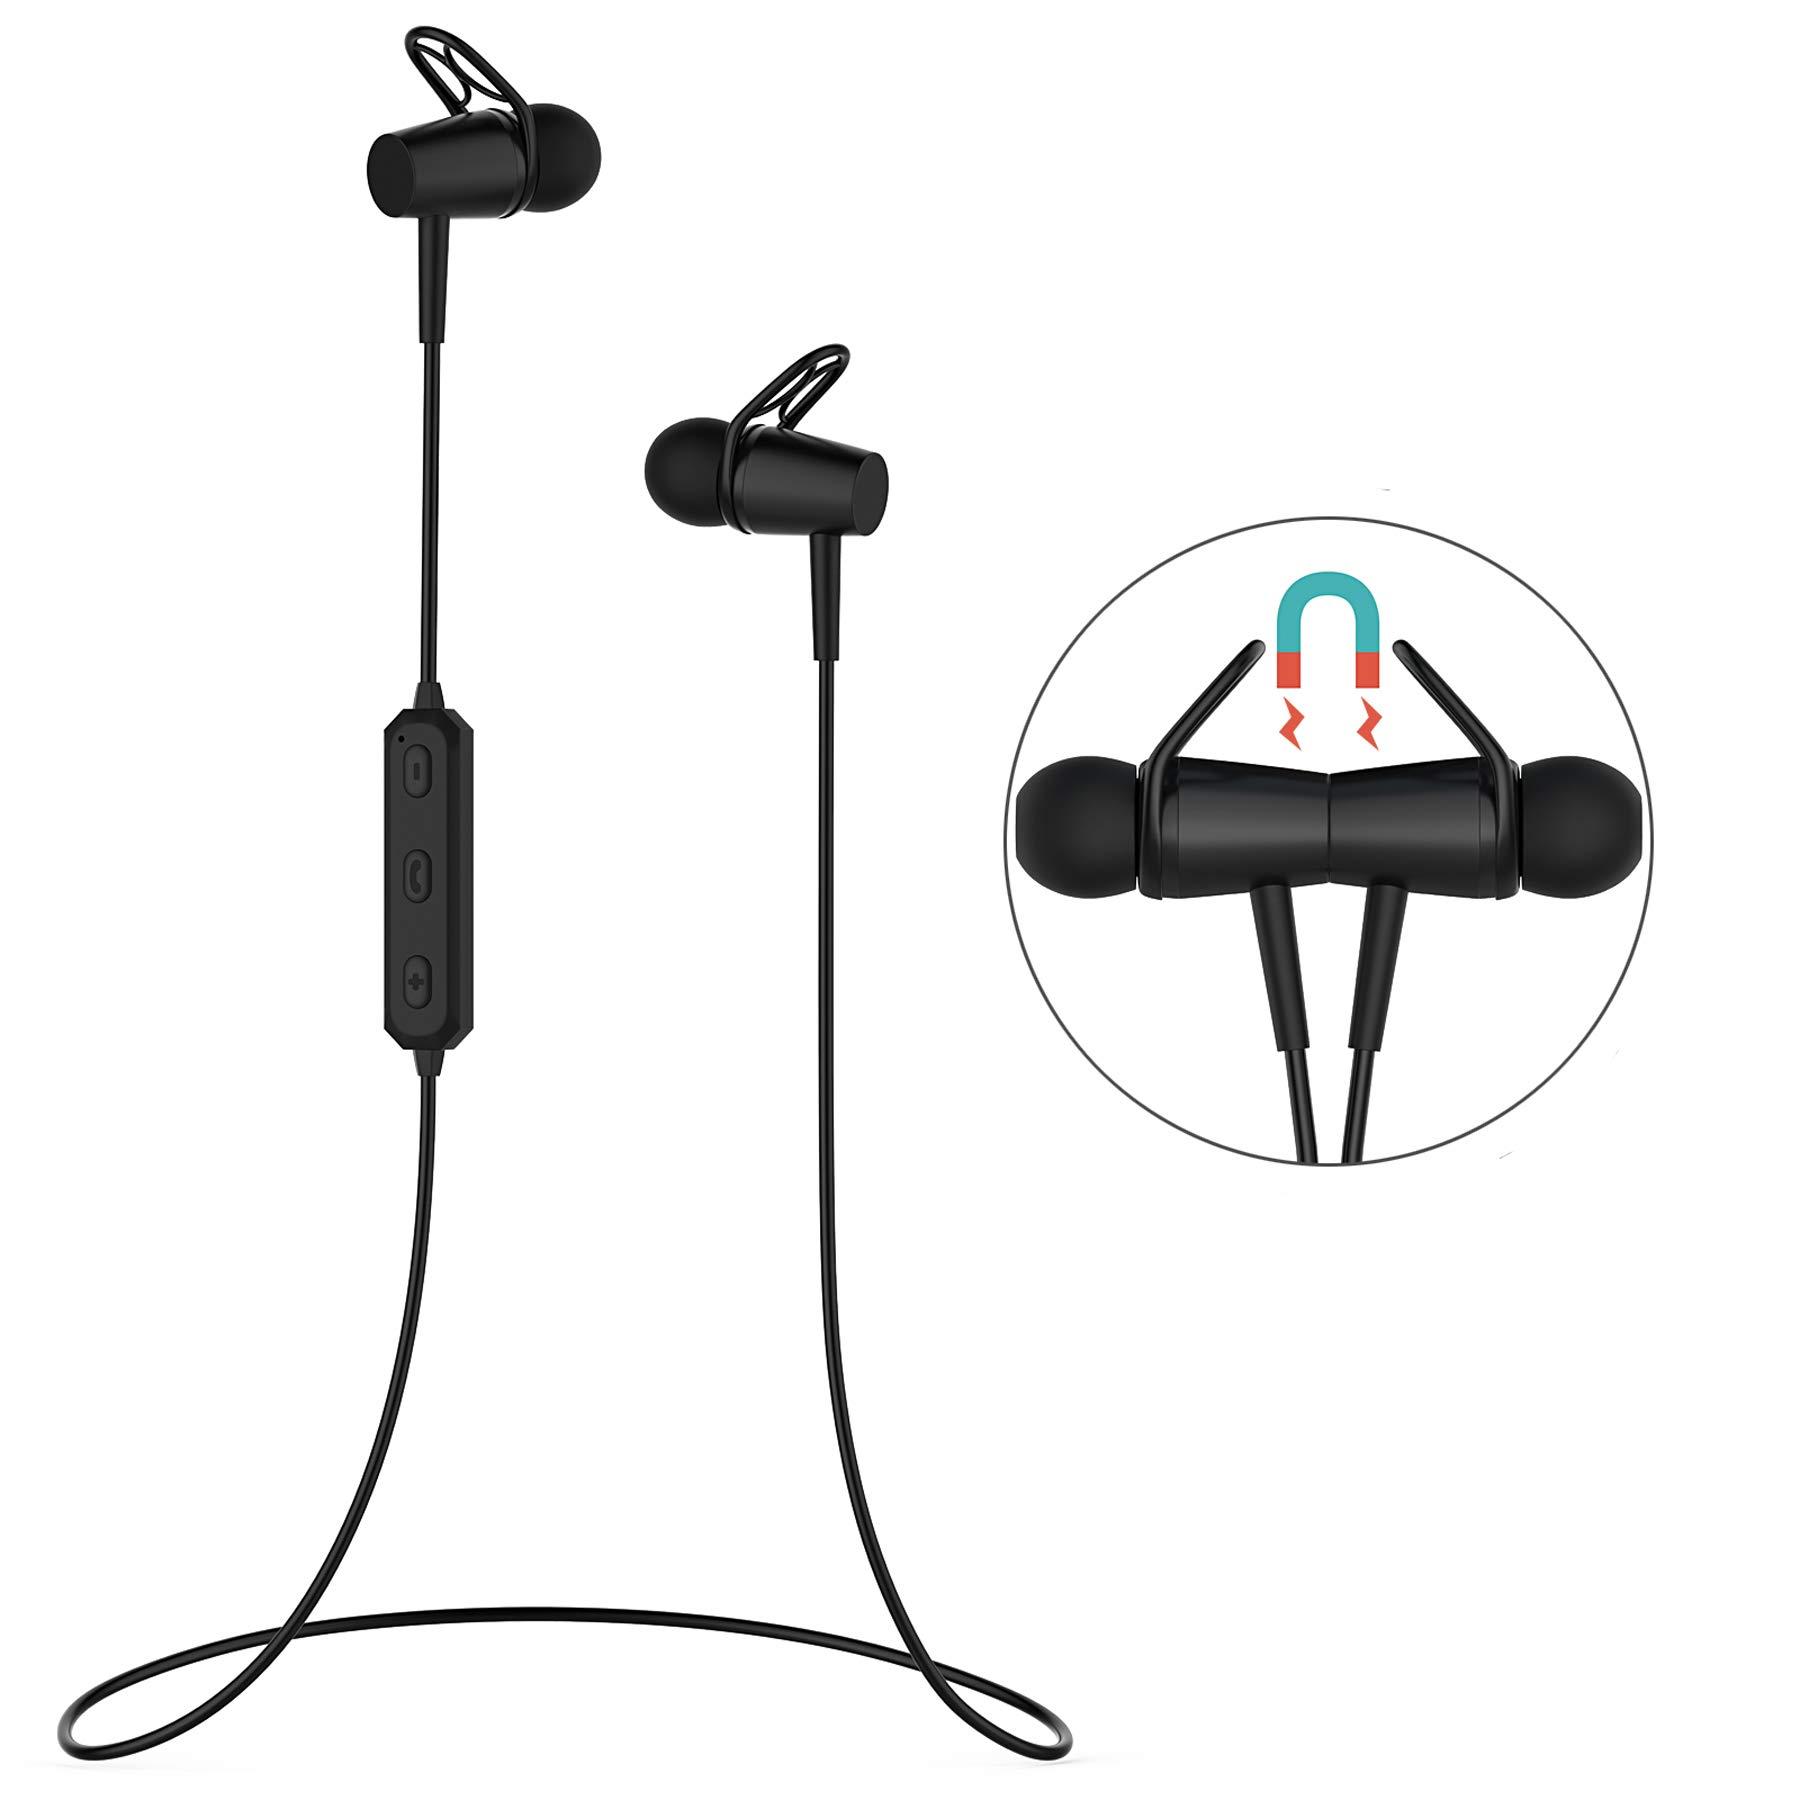 Bluetooth Earphones, Bluetooth 4.2 Magnetic Earphones, in-Ear Sweatproof Headphones with Mic for Running Gym Workout